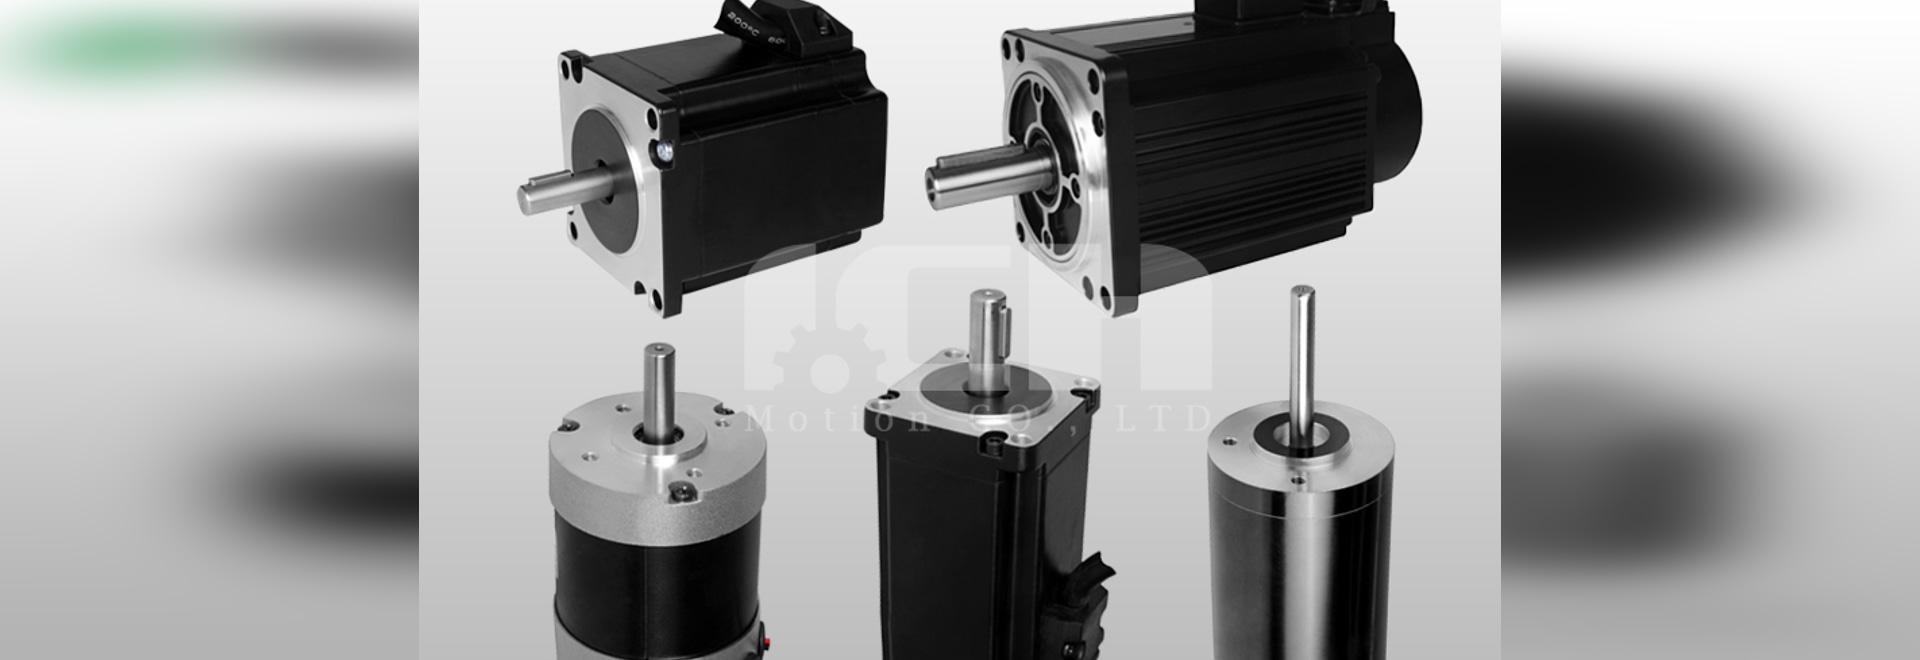 Four applications of brushless motor in household appliances market